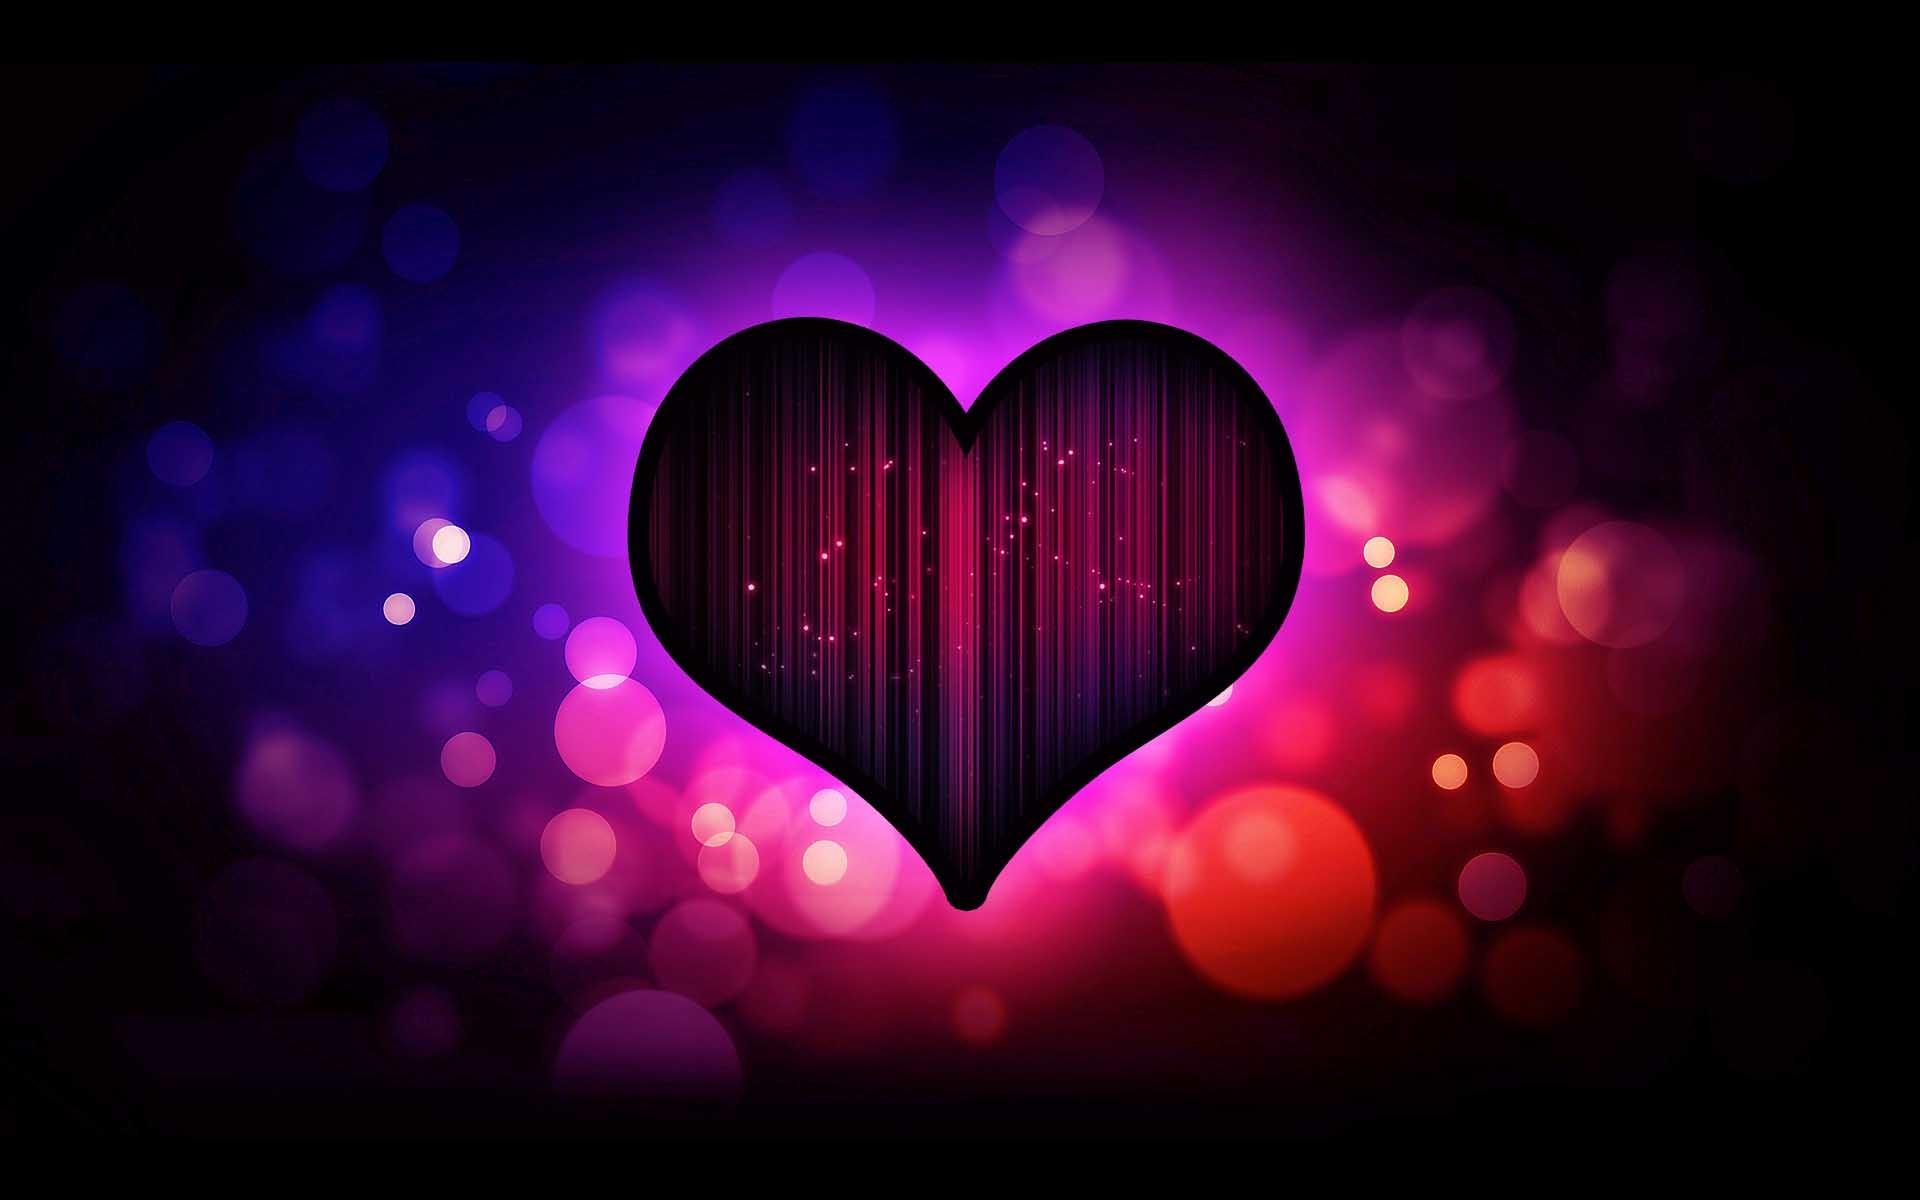 Download Purple Hearts HD Wallpapers for Desktop